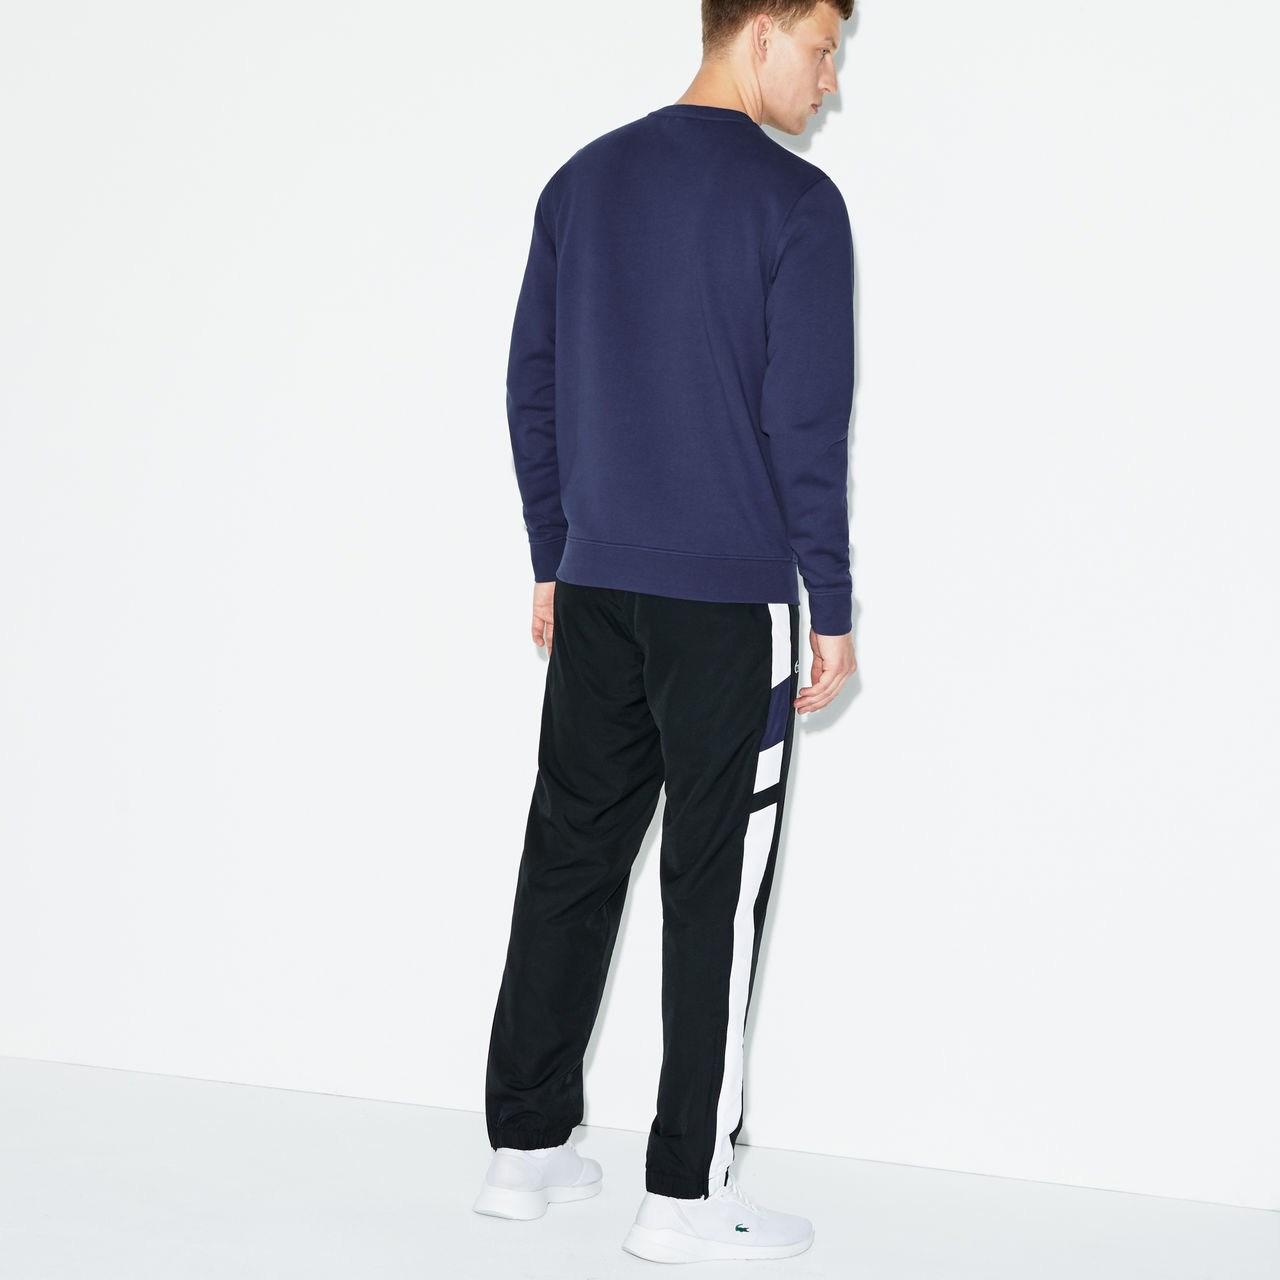 Survêtement De Pantalon Tennis Inkwell Lacoste Blackwhite AjL4q35R